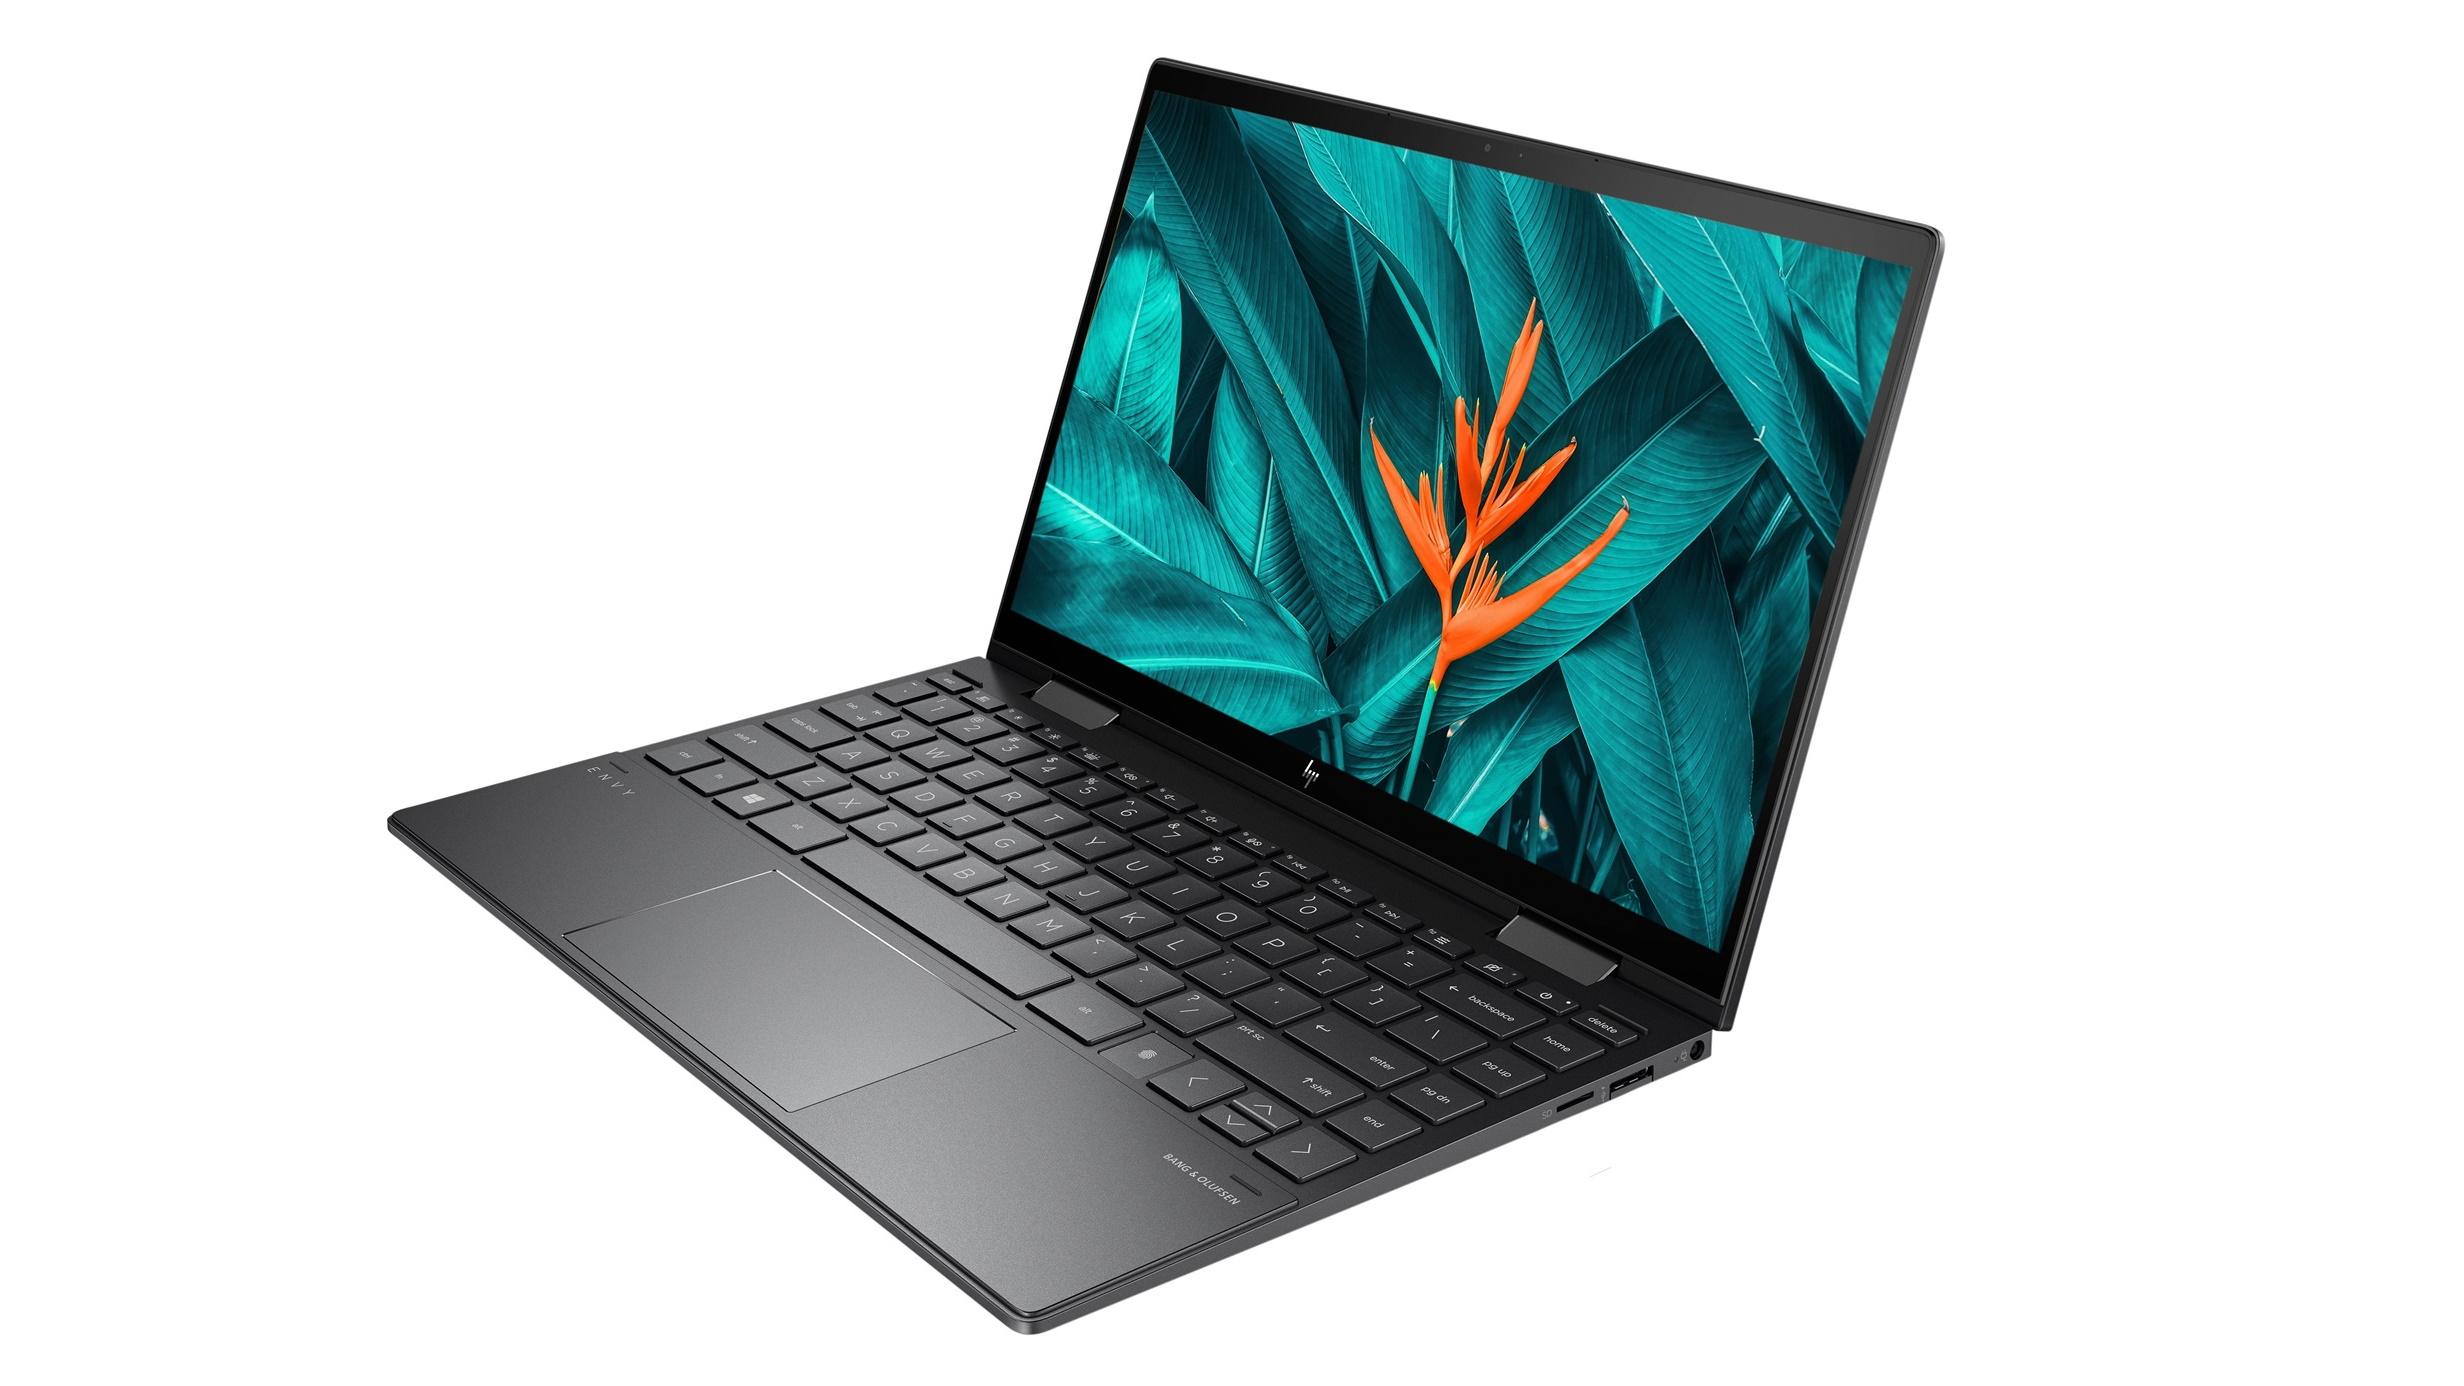 HP Envy x360 13 (2020)